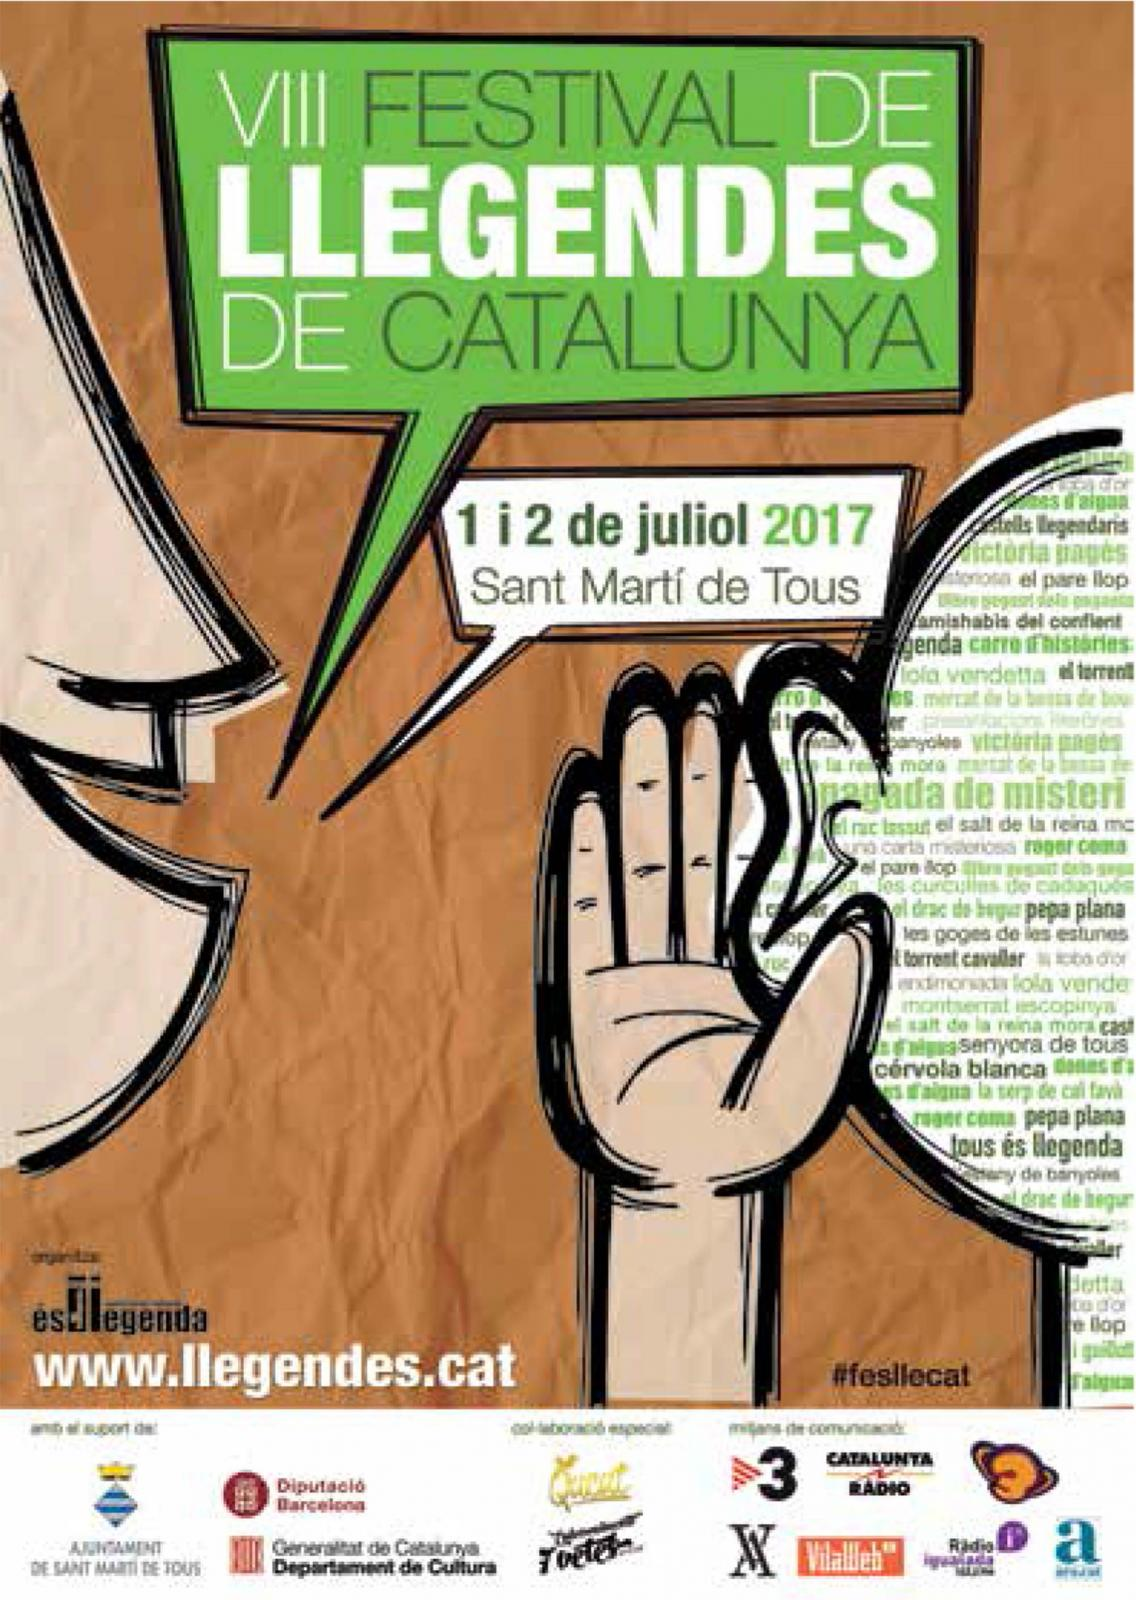 cartell 8è Fesllecat